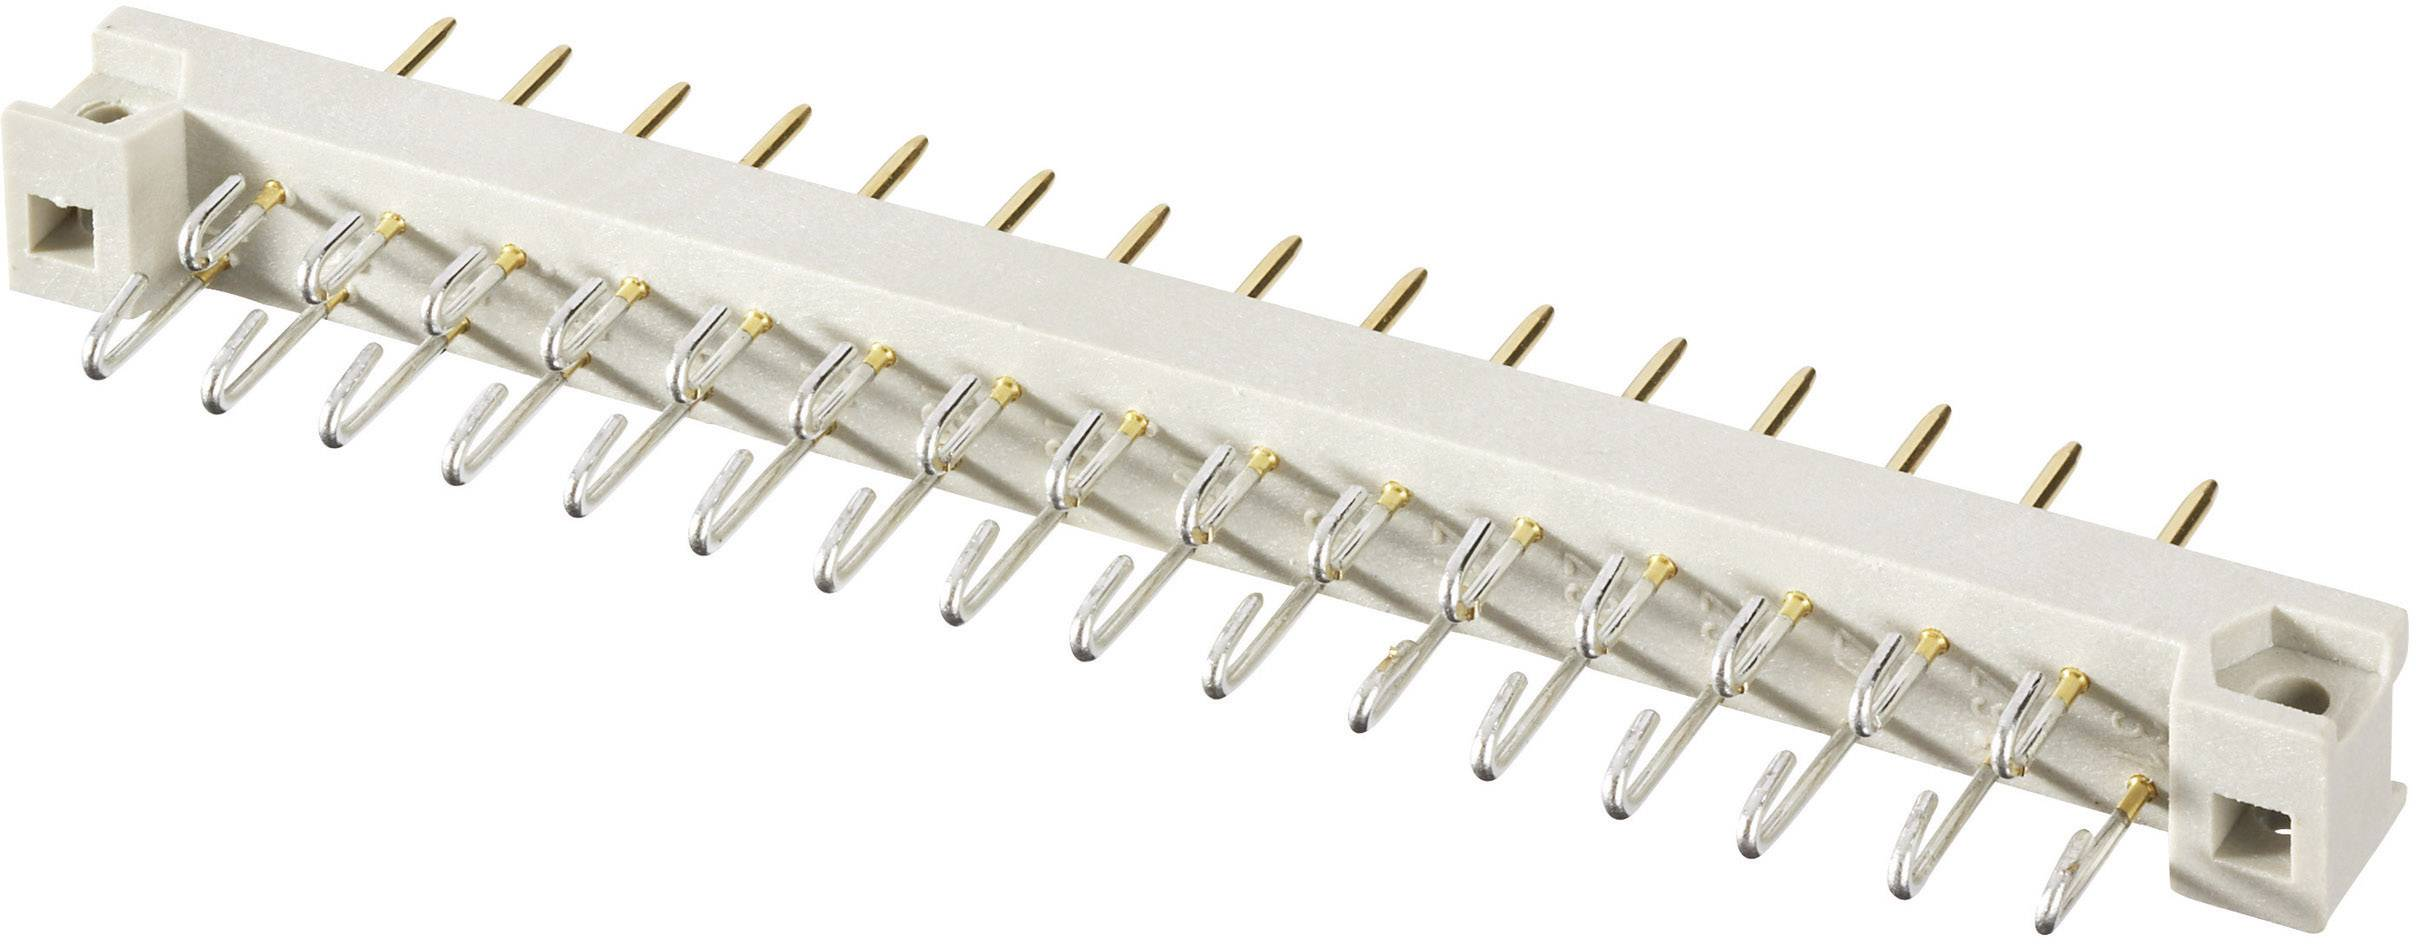 Pinová lišta Conec 101A10139X, 13pól., 3,8 mm